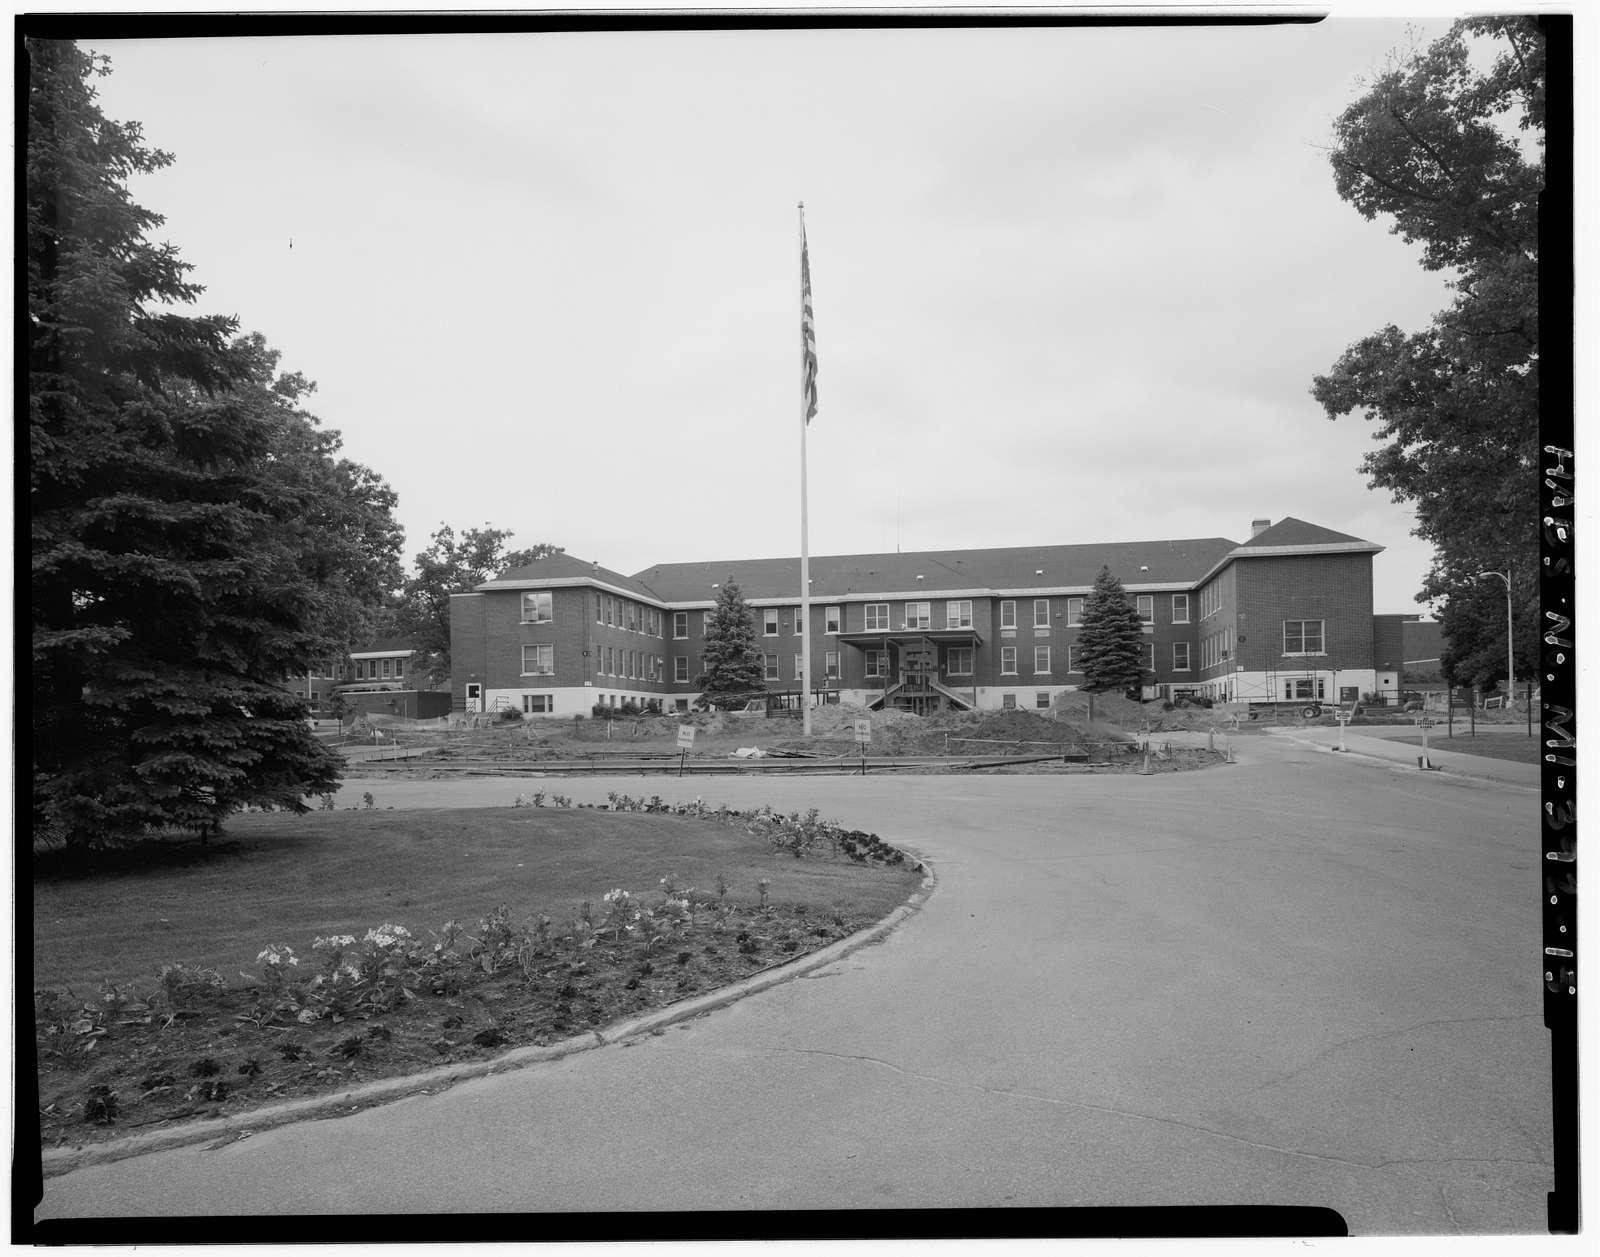 U.S. Veterans Bureau Hospital No. 100, 5500 Armstrong Road, Battle Creek, Calhoun County, MI